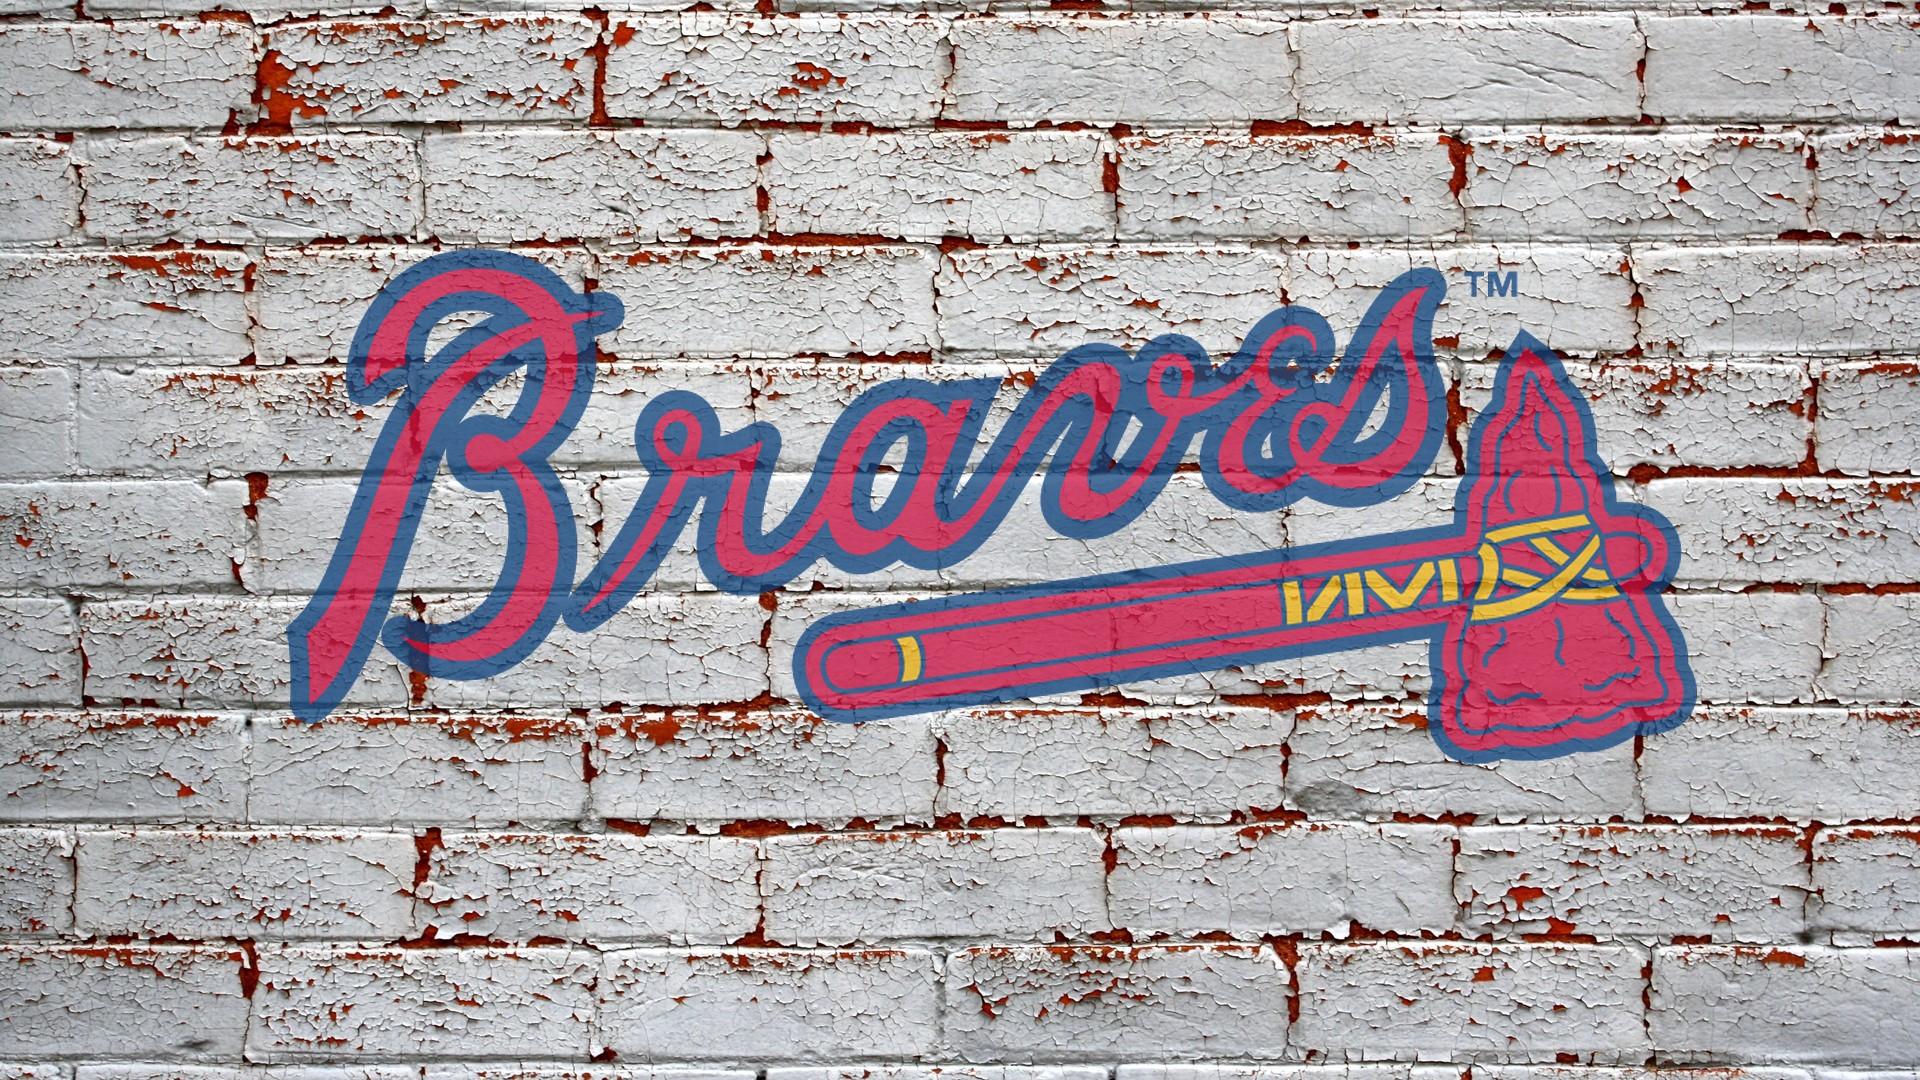 6 Hd Atlanta Braves Wallpapers Hdwallsource Com